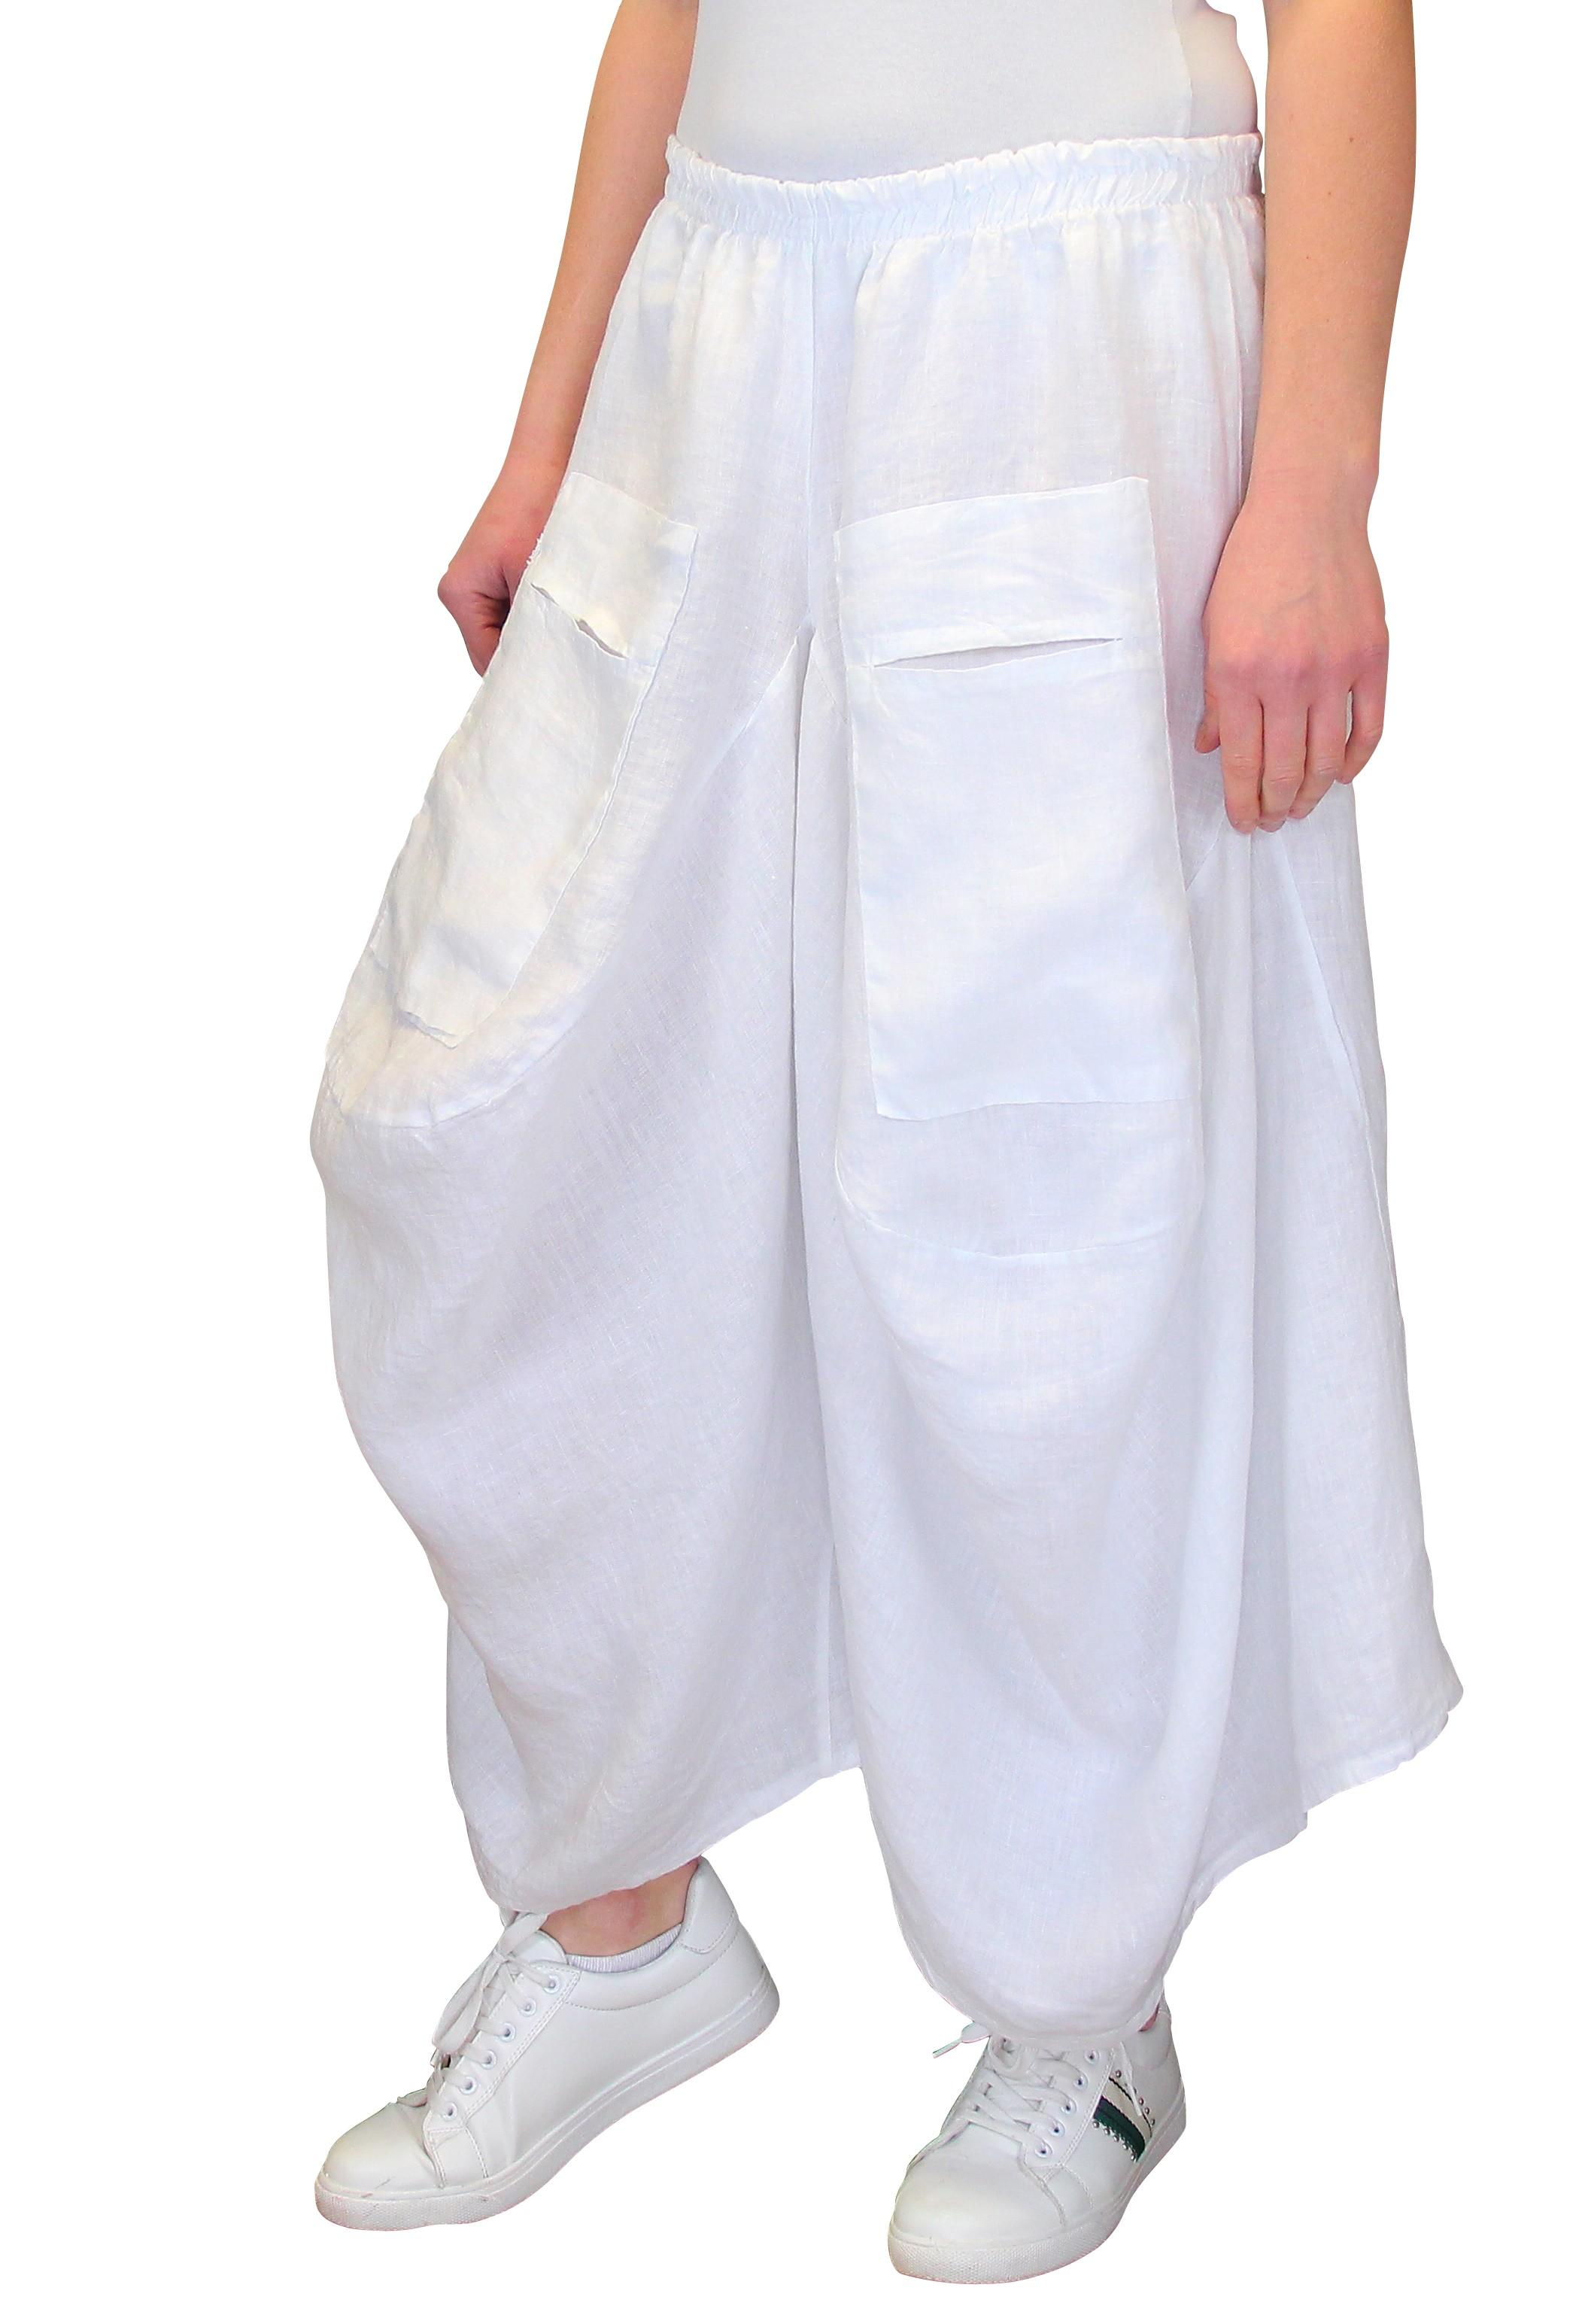 Agreable de porter de la lingerie feminine - 5 4